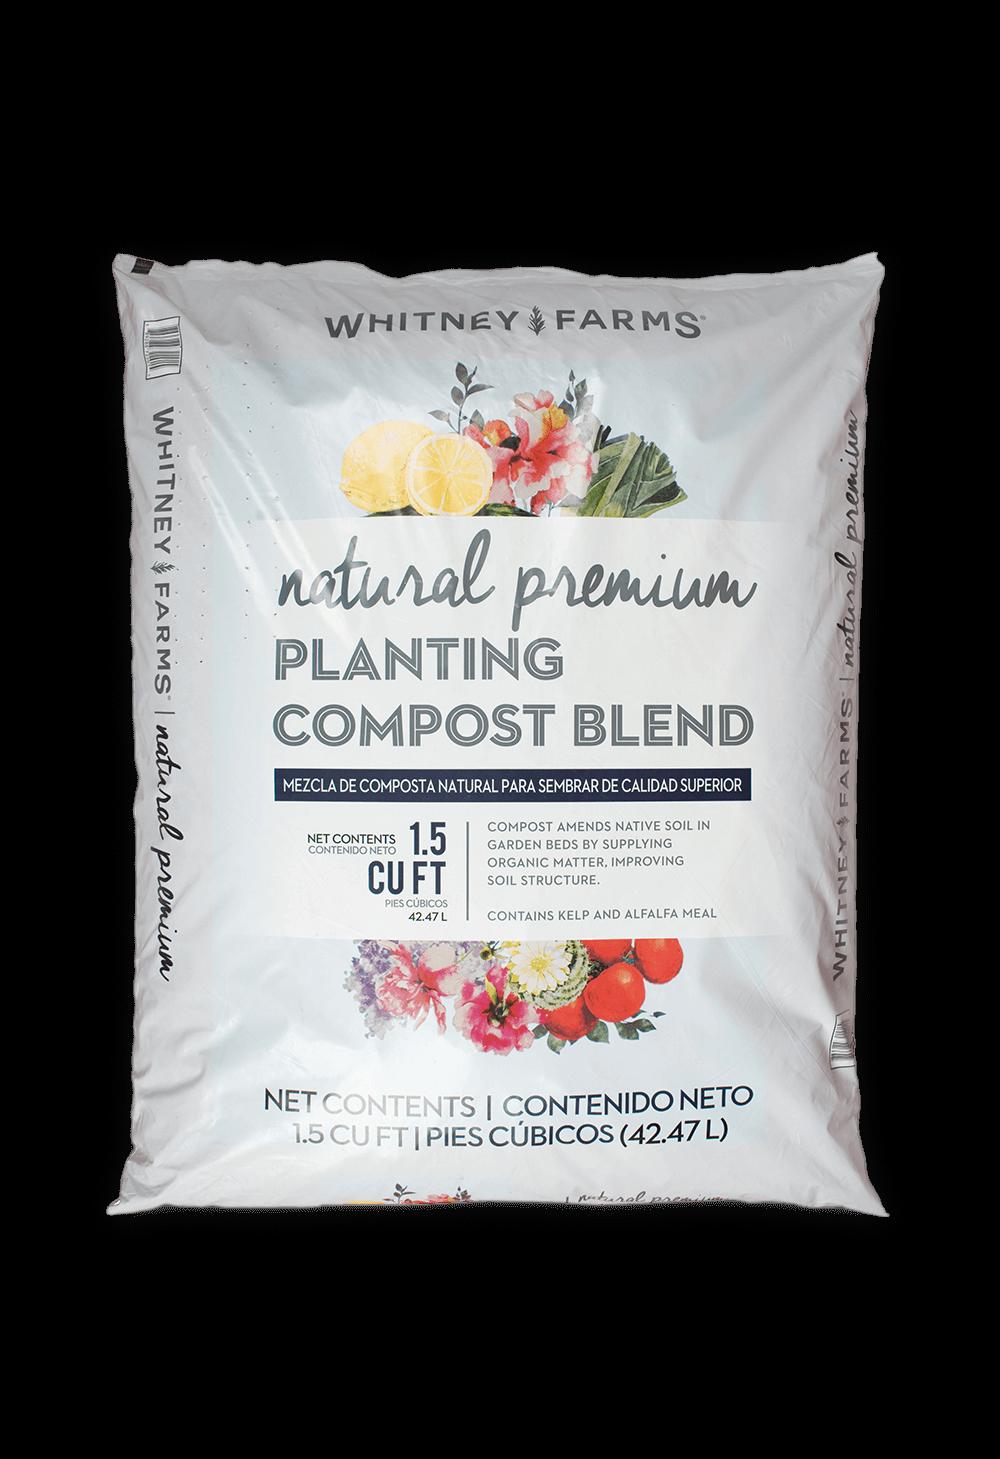 Planting Compost Blend